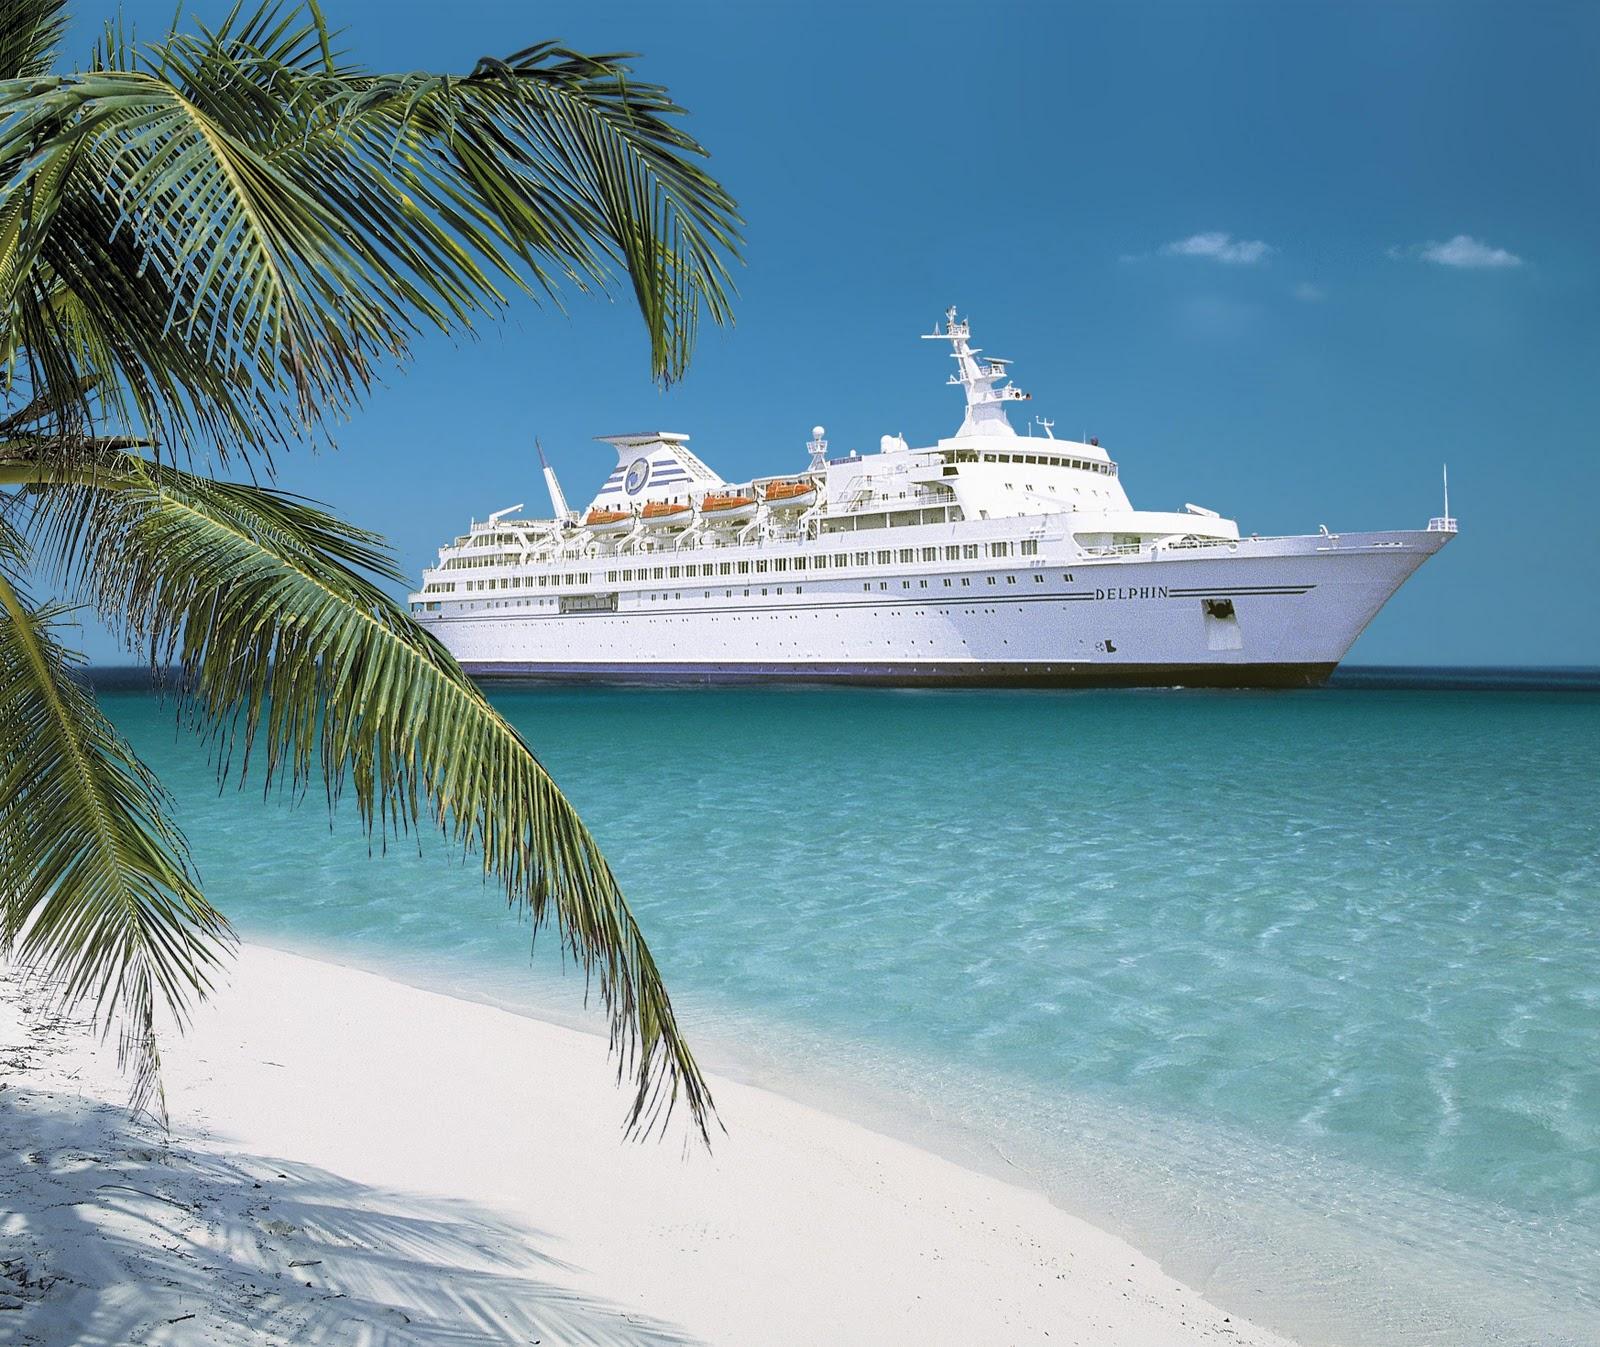 Mein Schiff TUI Gay Cruise Schwule Erlebnisreisen